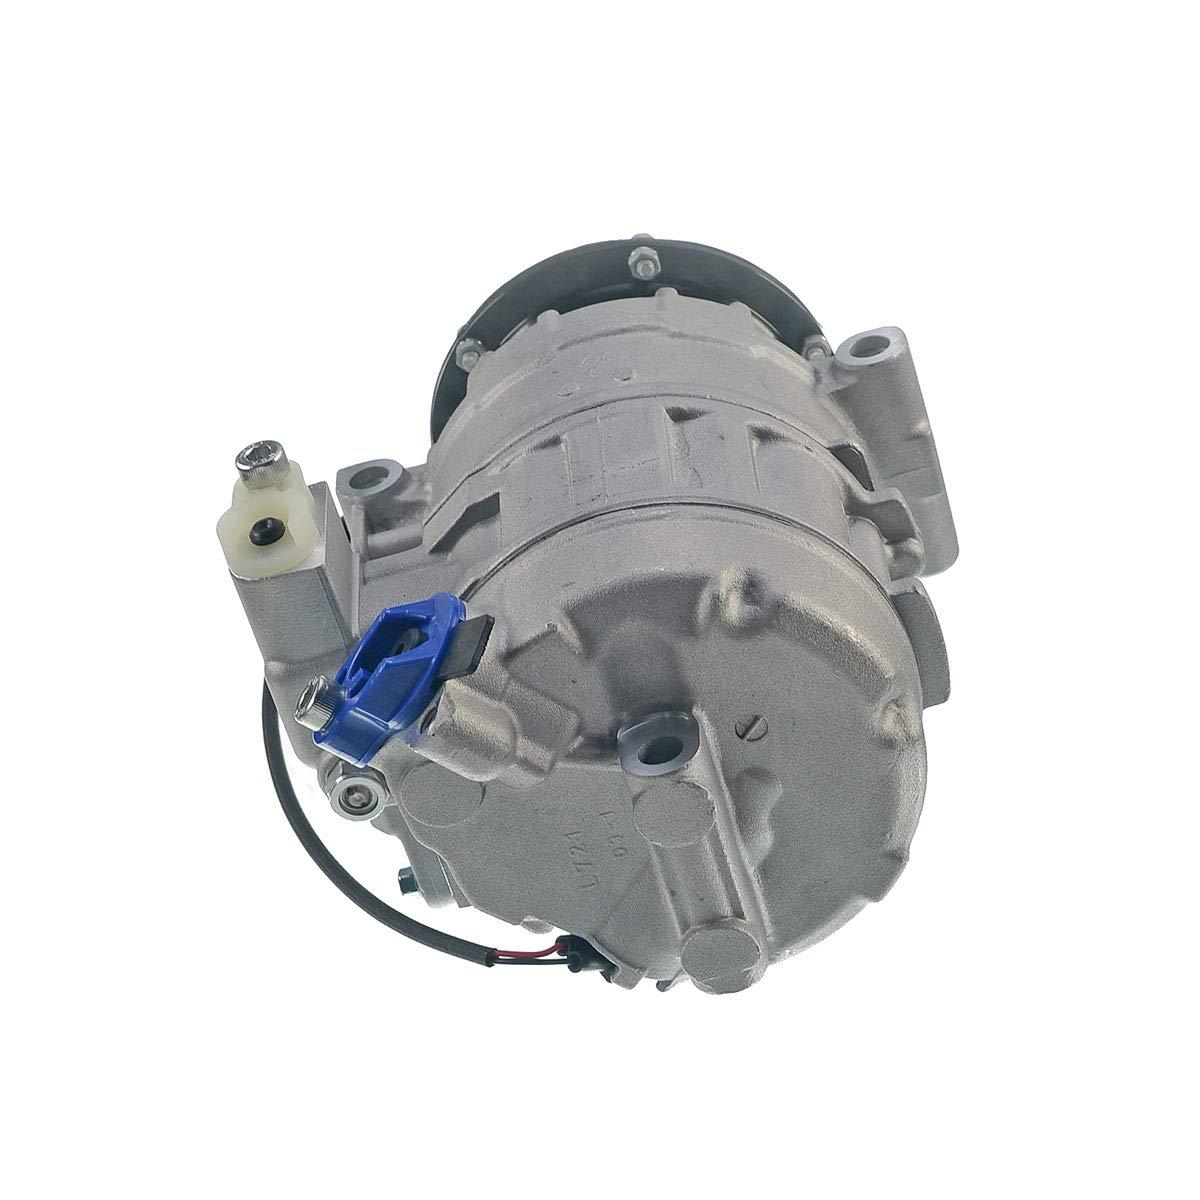 Kompressor Klimaanlage f/ür Multivan V Phaeton Touareg Transporter 2.5L 4.9L 2002-2010 7H0820805C